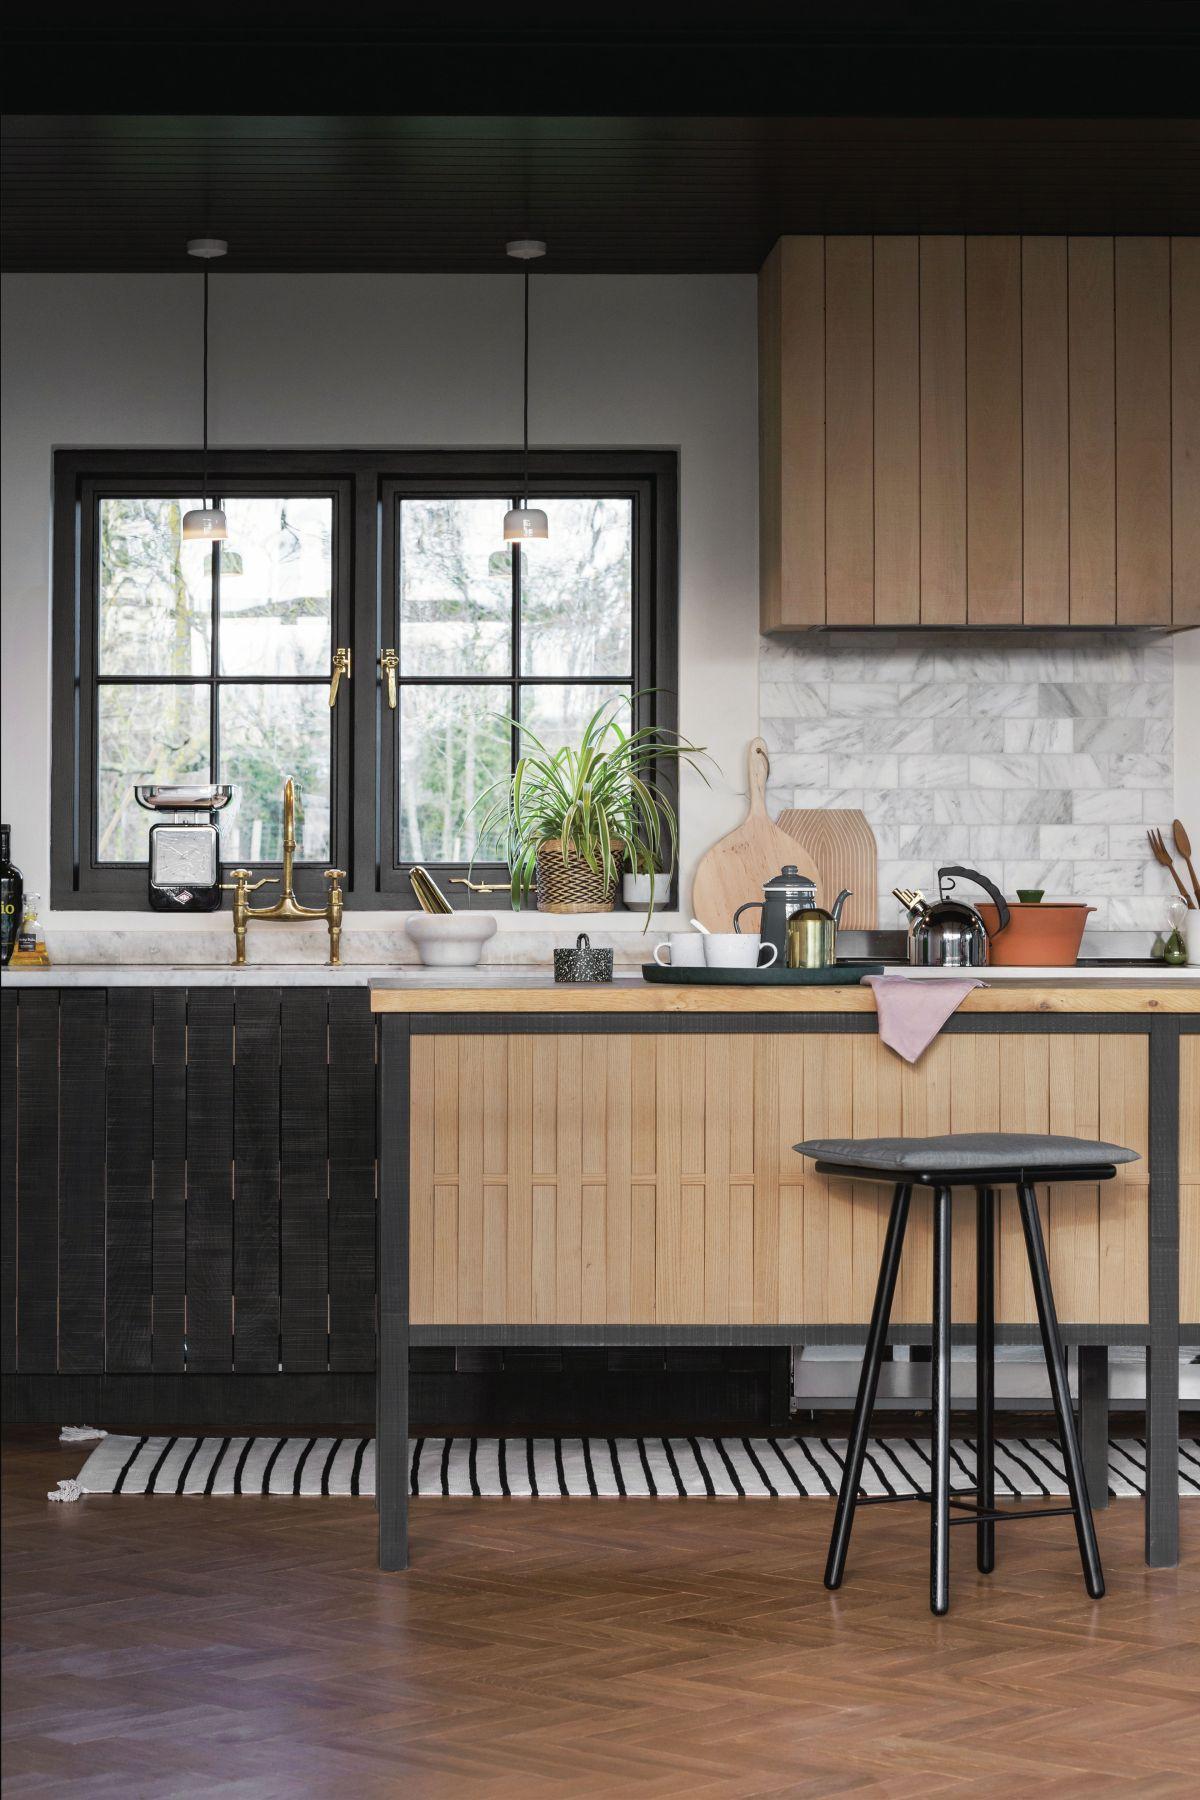 12 kitchen window ideas